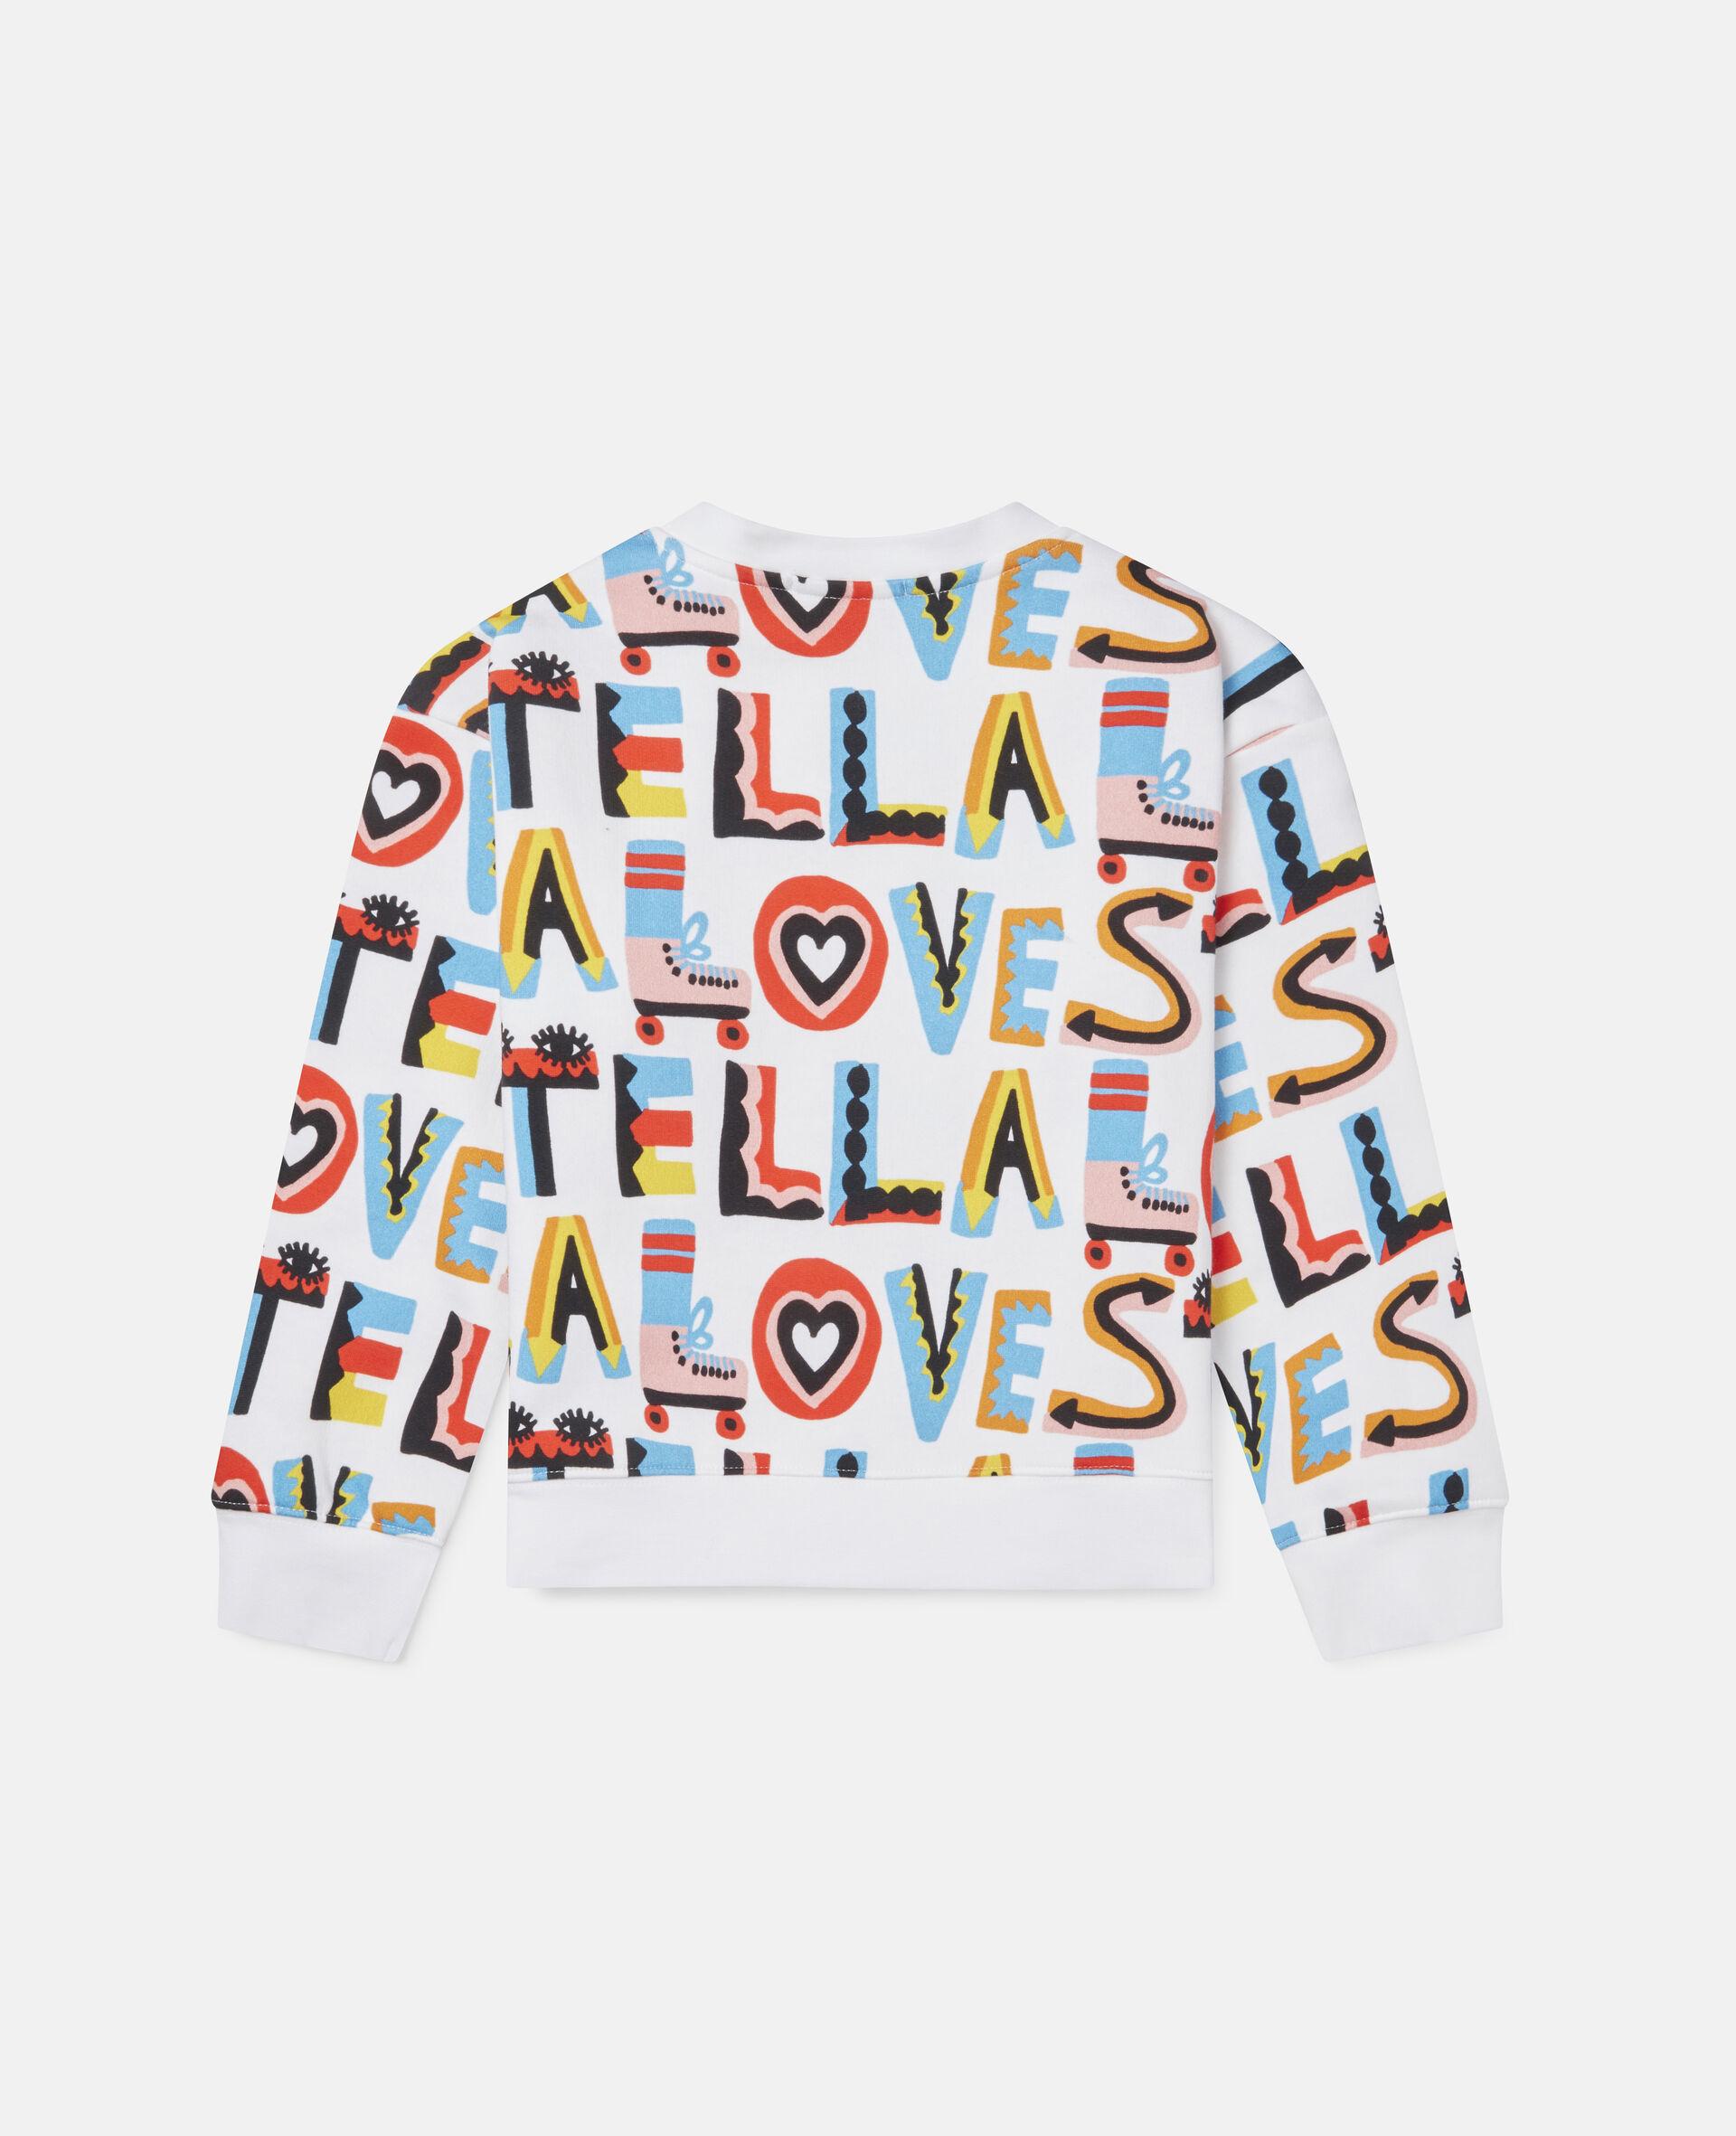 Stella Loves Oversize Fleece Sweatshirt-White-large image number 3